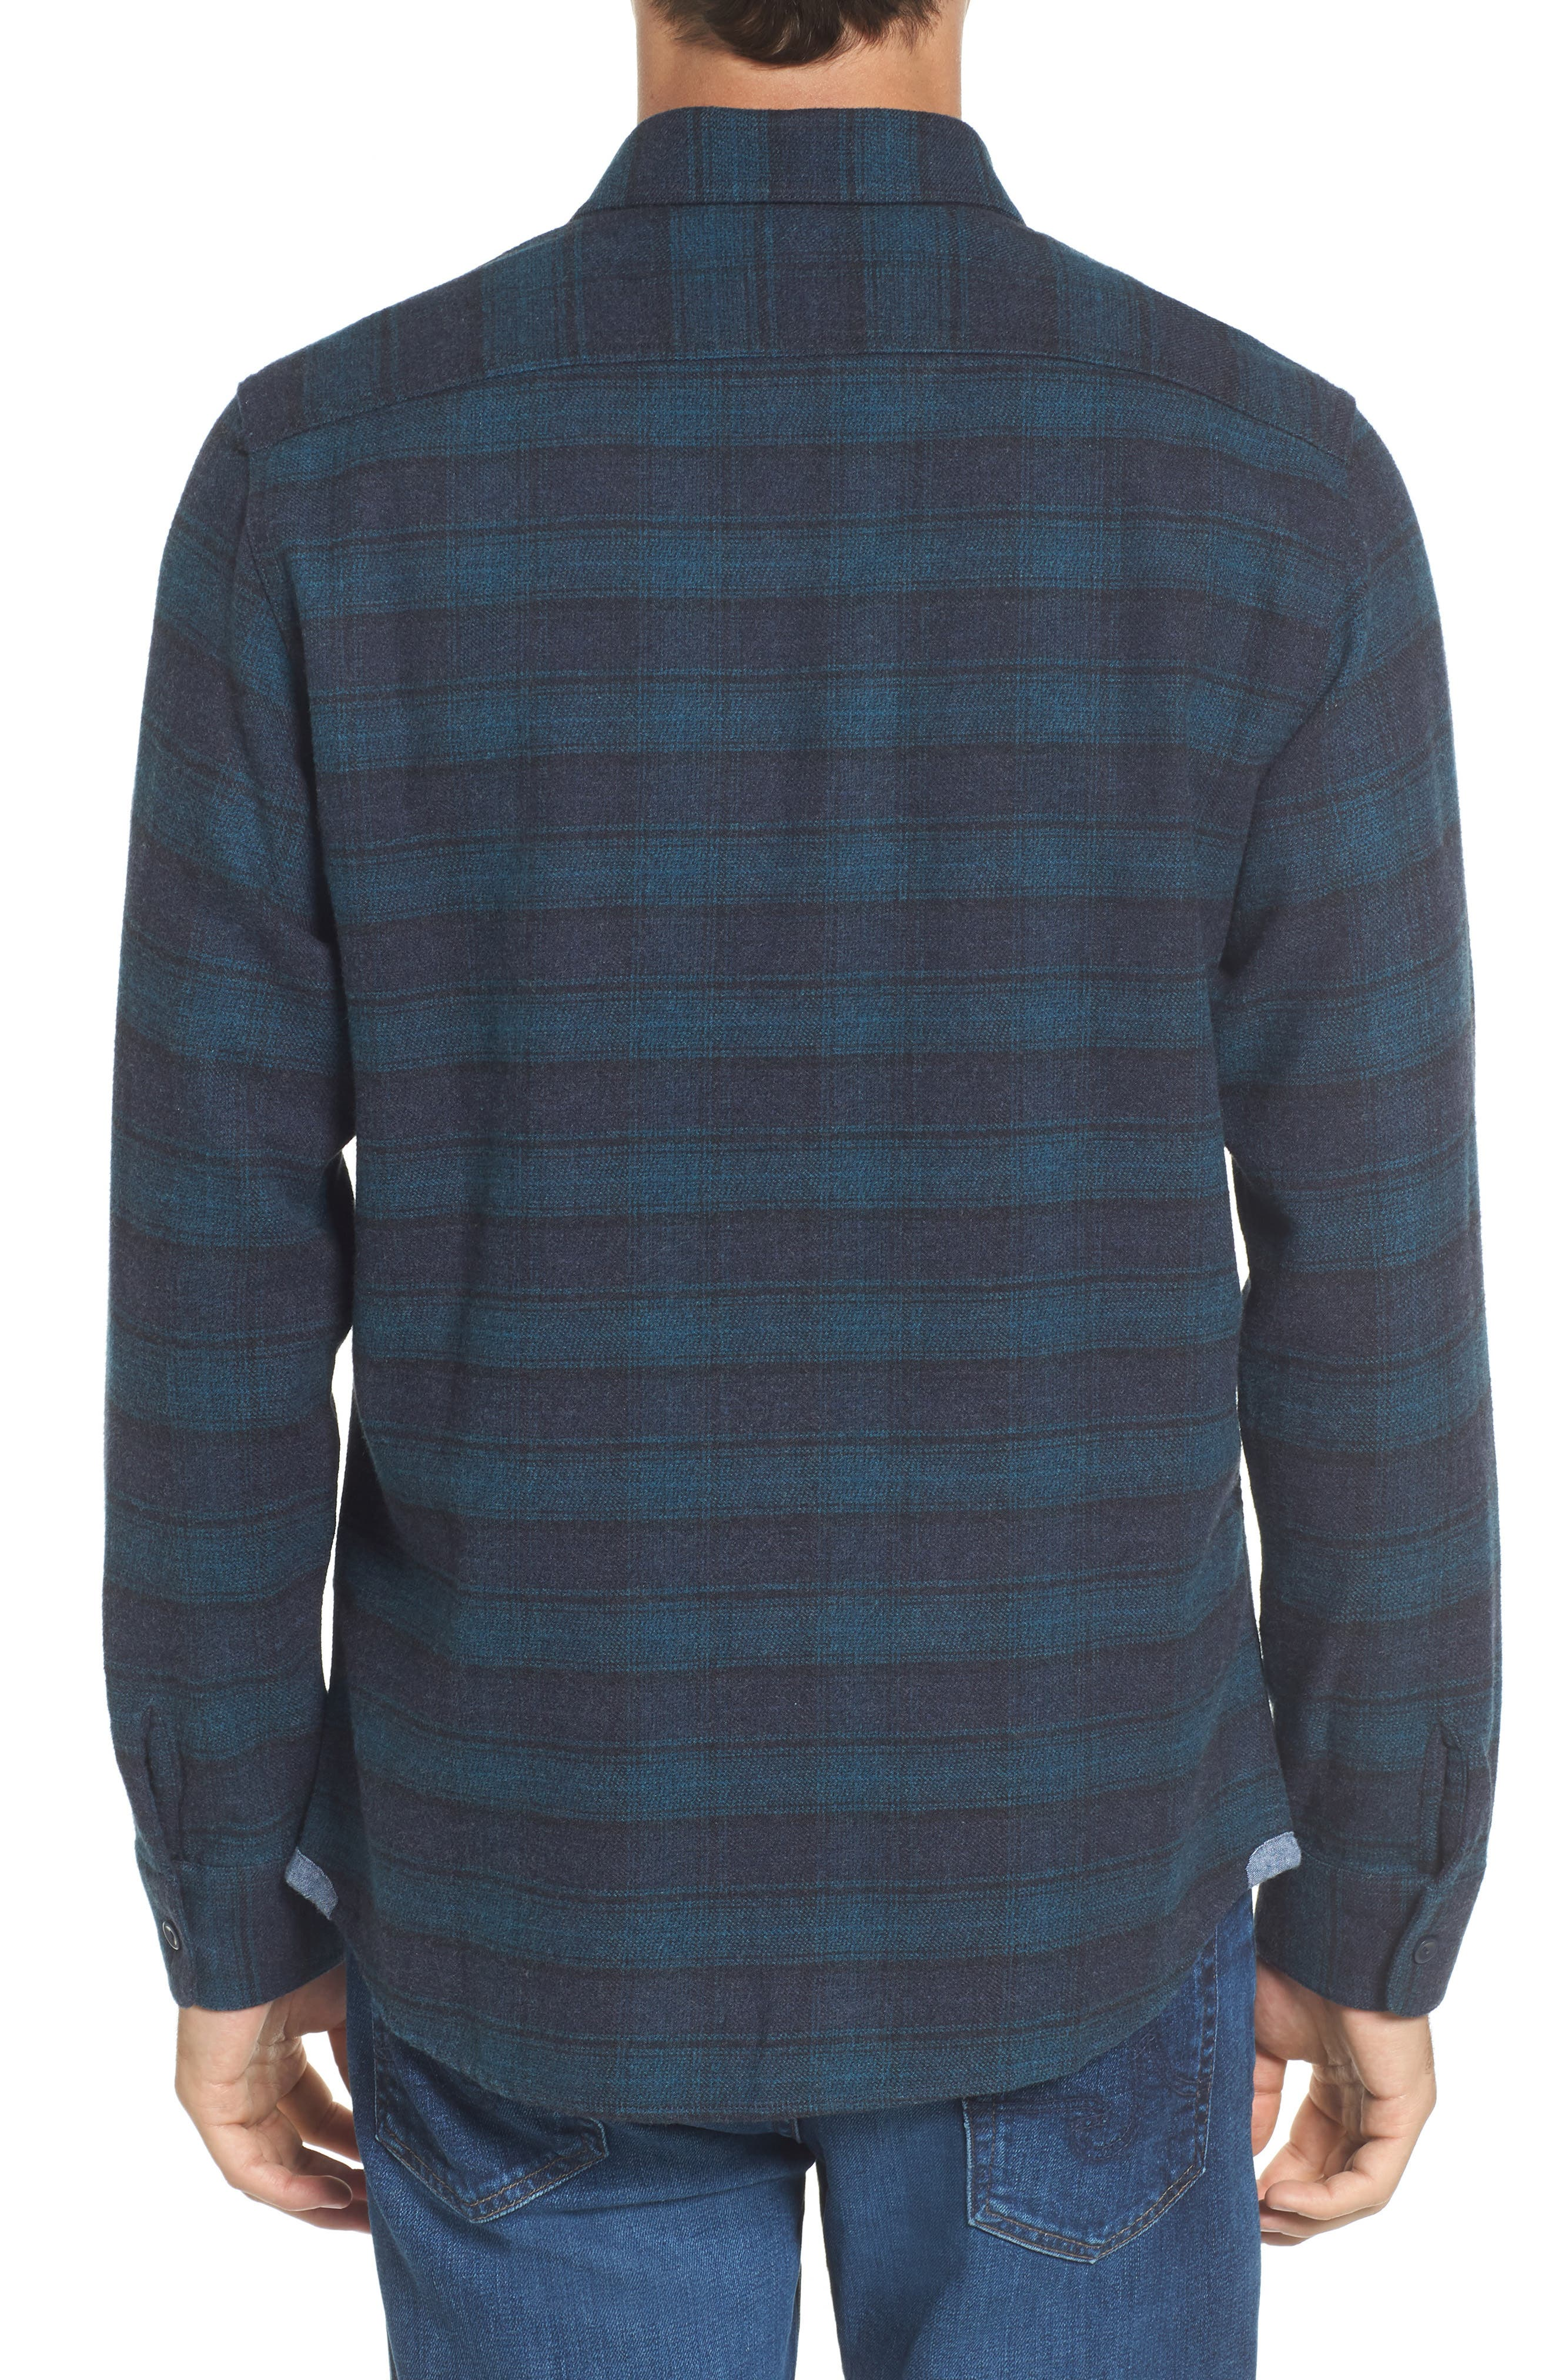 Cortland Heritage Modern Fit Flannel Sport Shirt,                             Alternate thumbnail 2, color,                             341